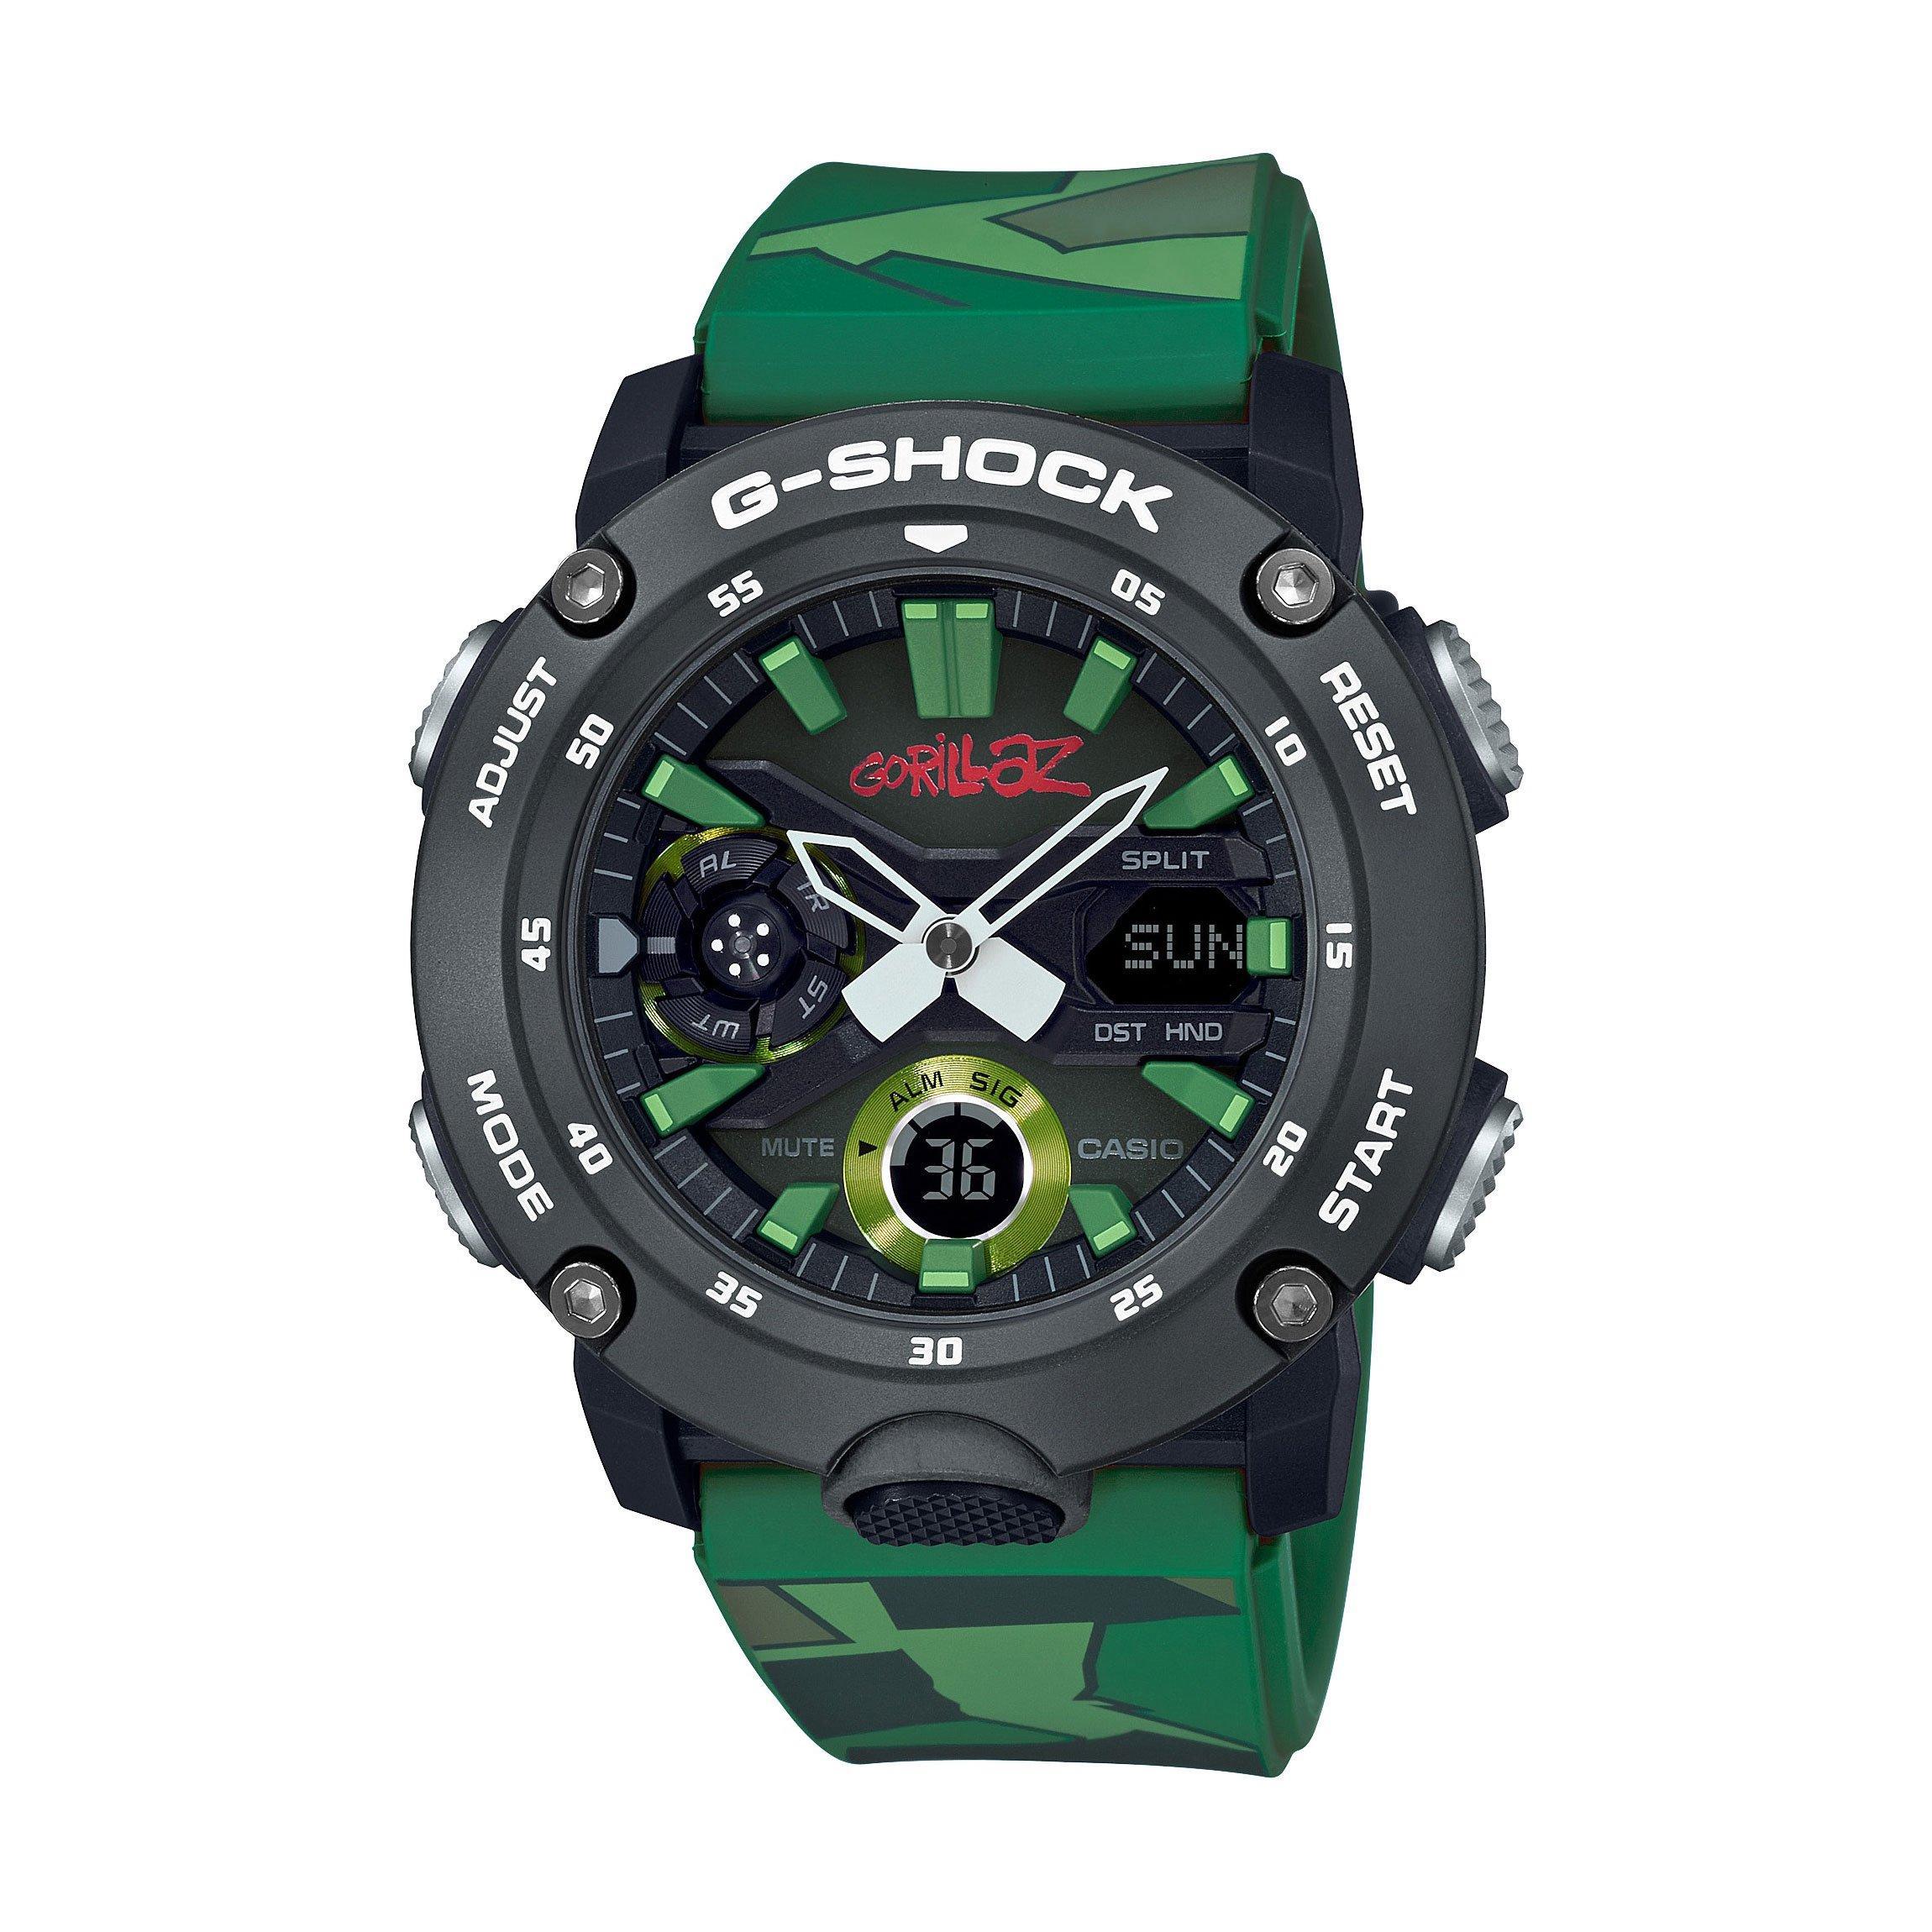 Casio G-Shock Gorillaz Camo Men's Watch